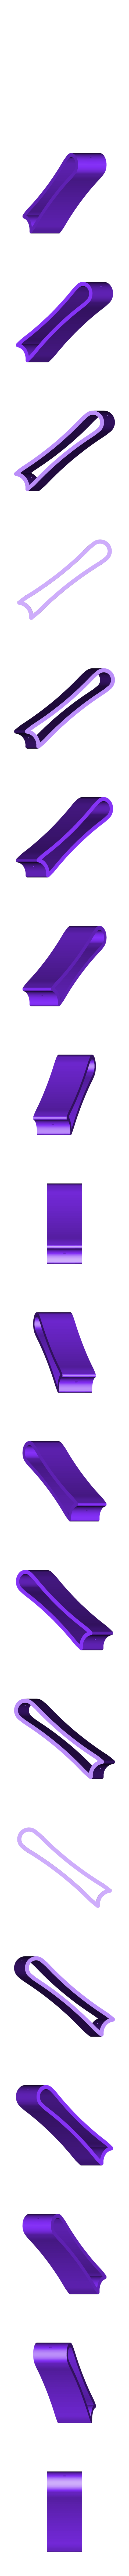 C7_X1.stl Download STL file Adjustable lamp - with vertebrae  • 3D printable object, Ciokobango